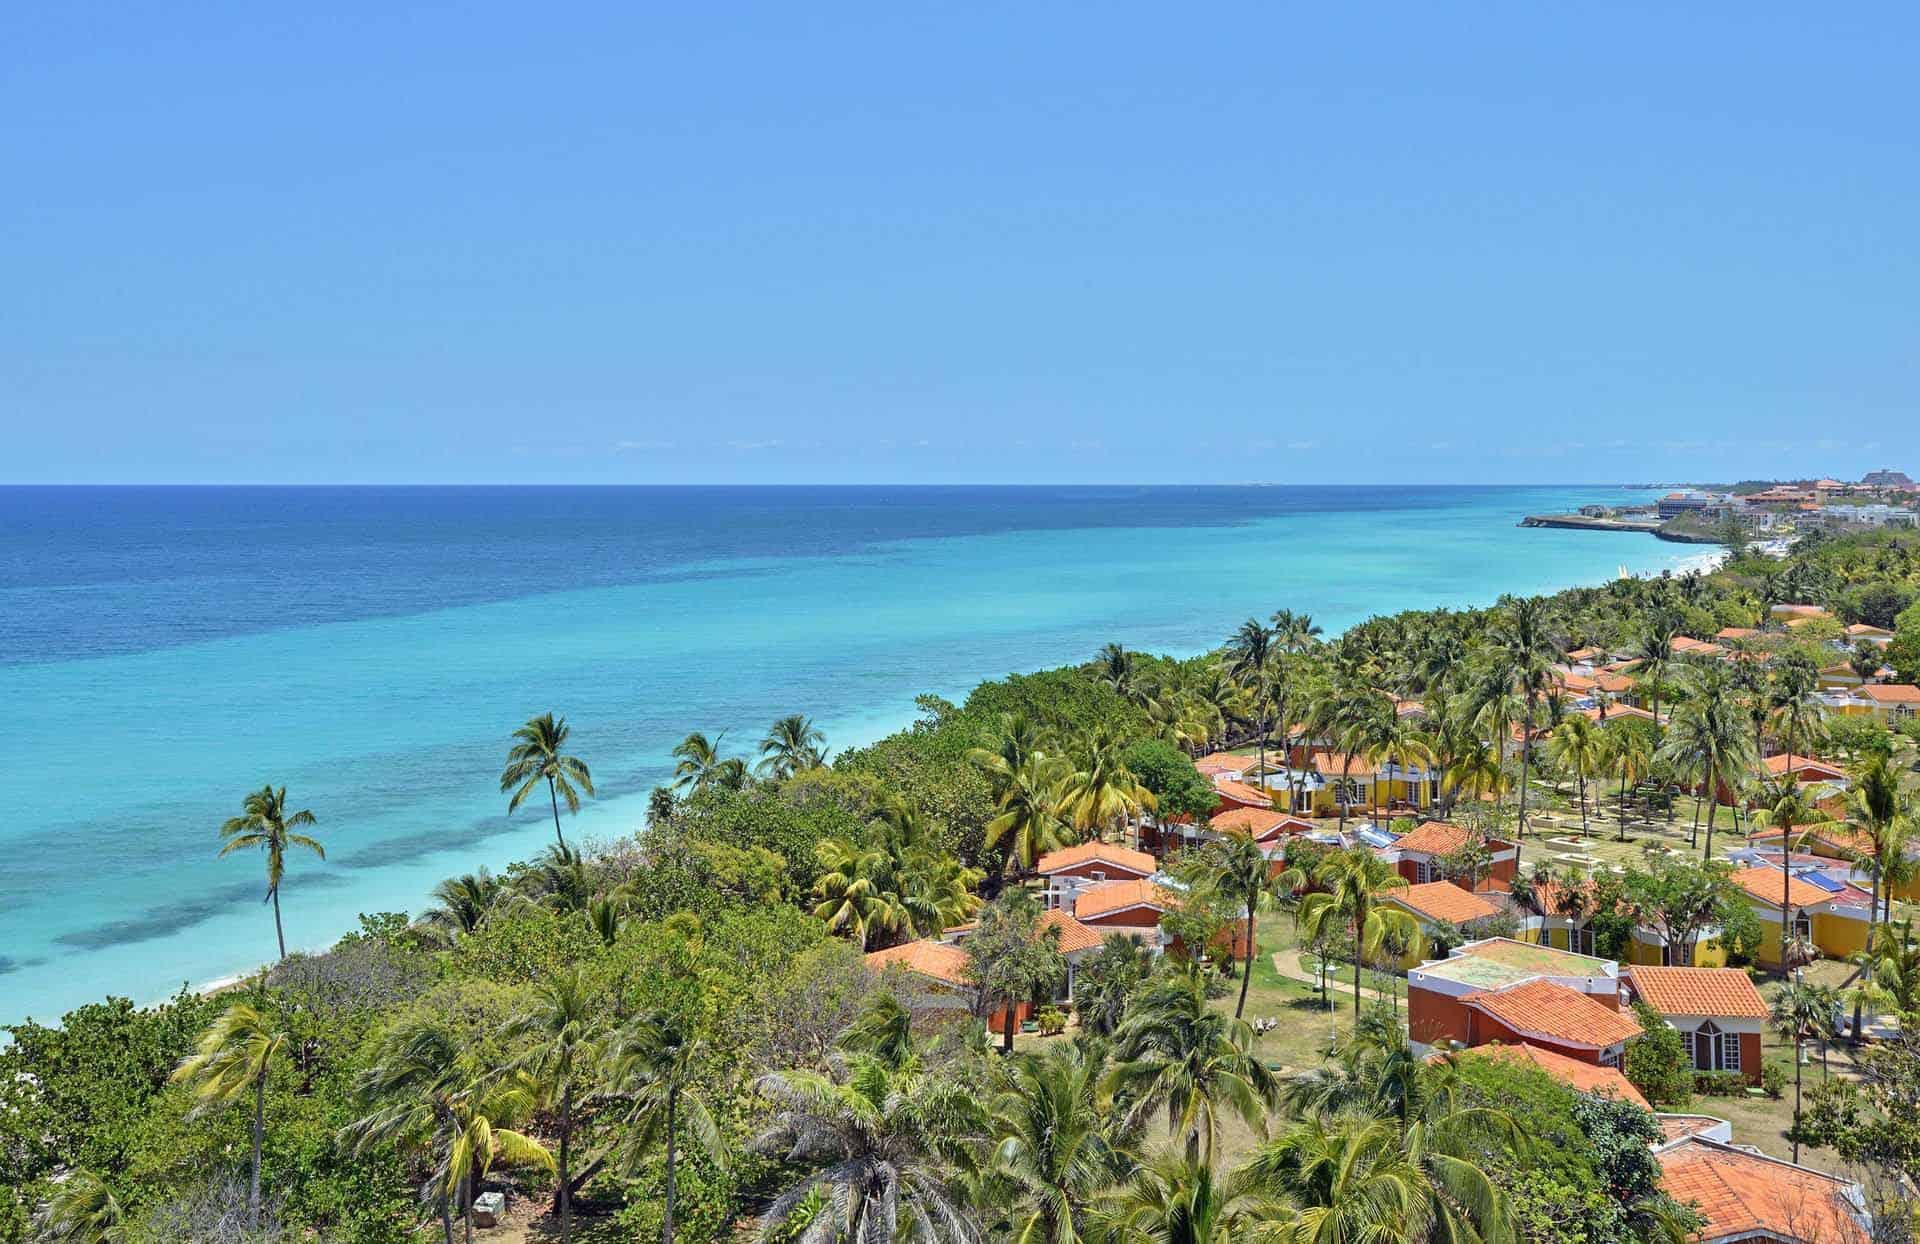 varadero hotel piscine plage mer cuba autrement 4